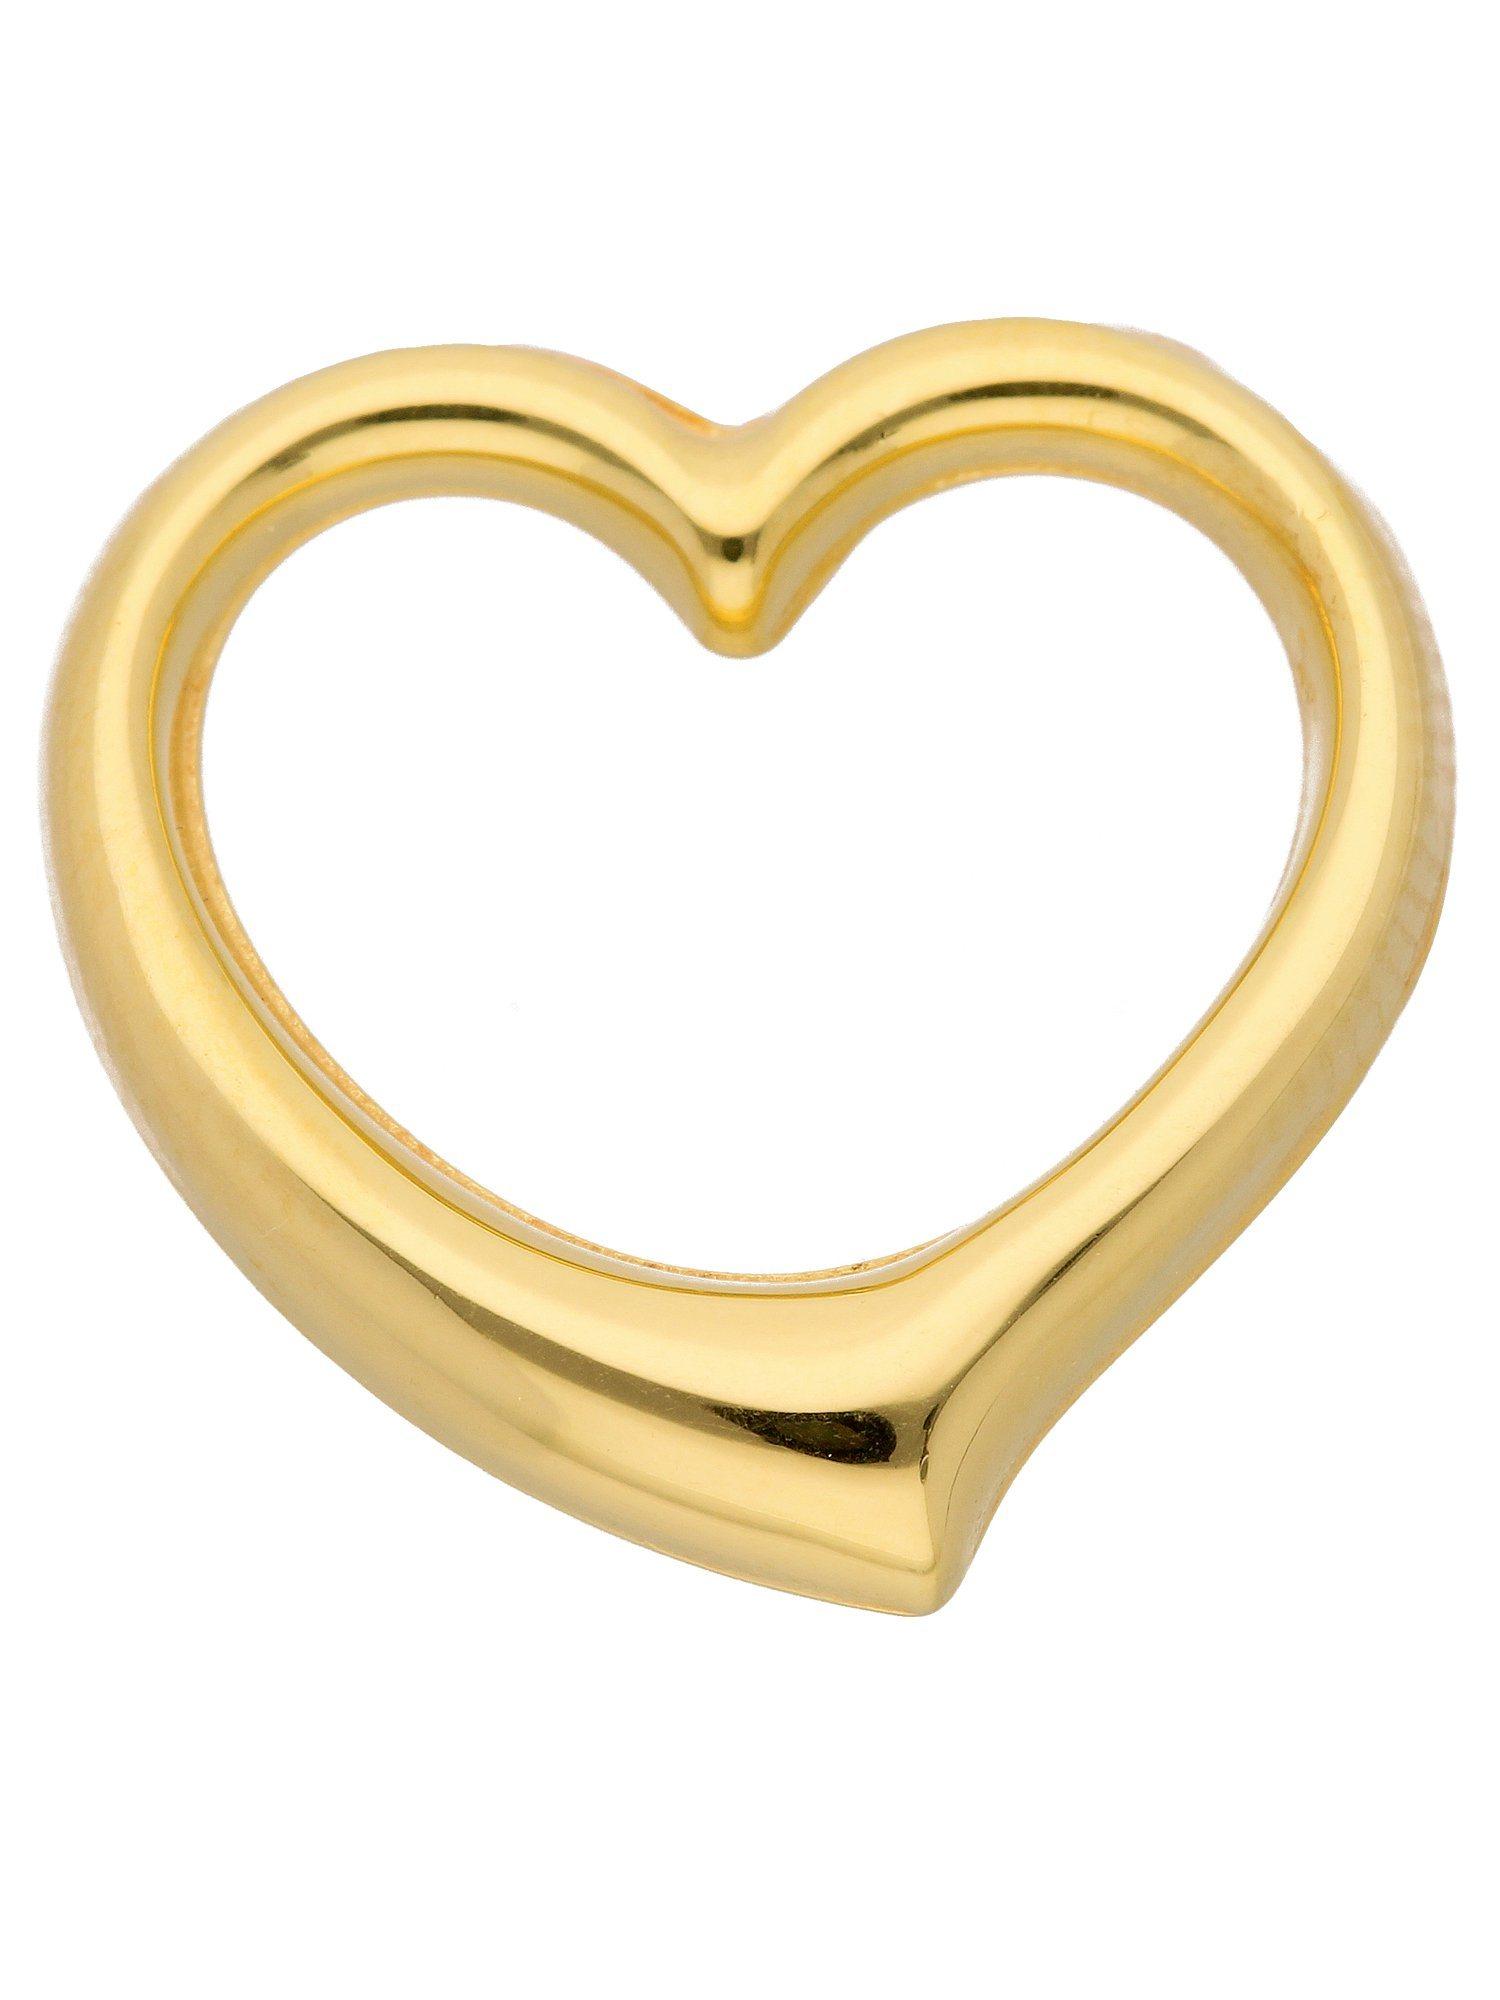 Adelia´s Kettenanhänger »Gold Anhänger« Swingheart 14 k 585 Gelbgold | Schmuck > Halsketten > Ketten ohne Anhänger | Adelia´s